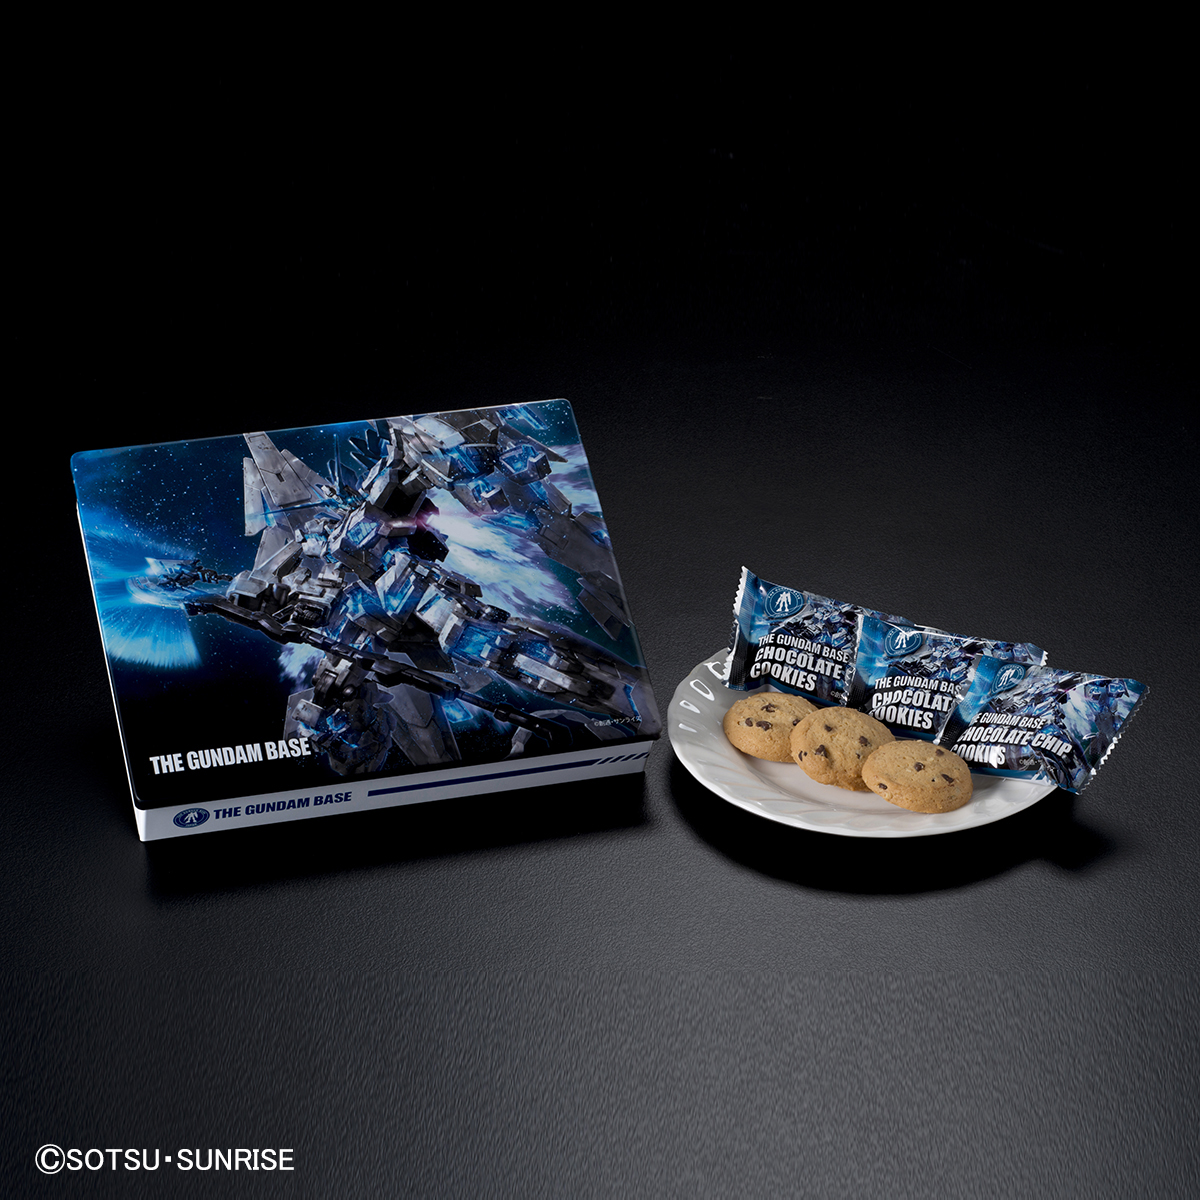 THE GUNDAM BASE チョコチップクッキー 商品画像